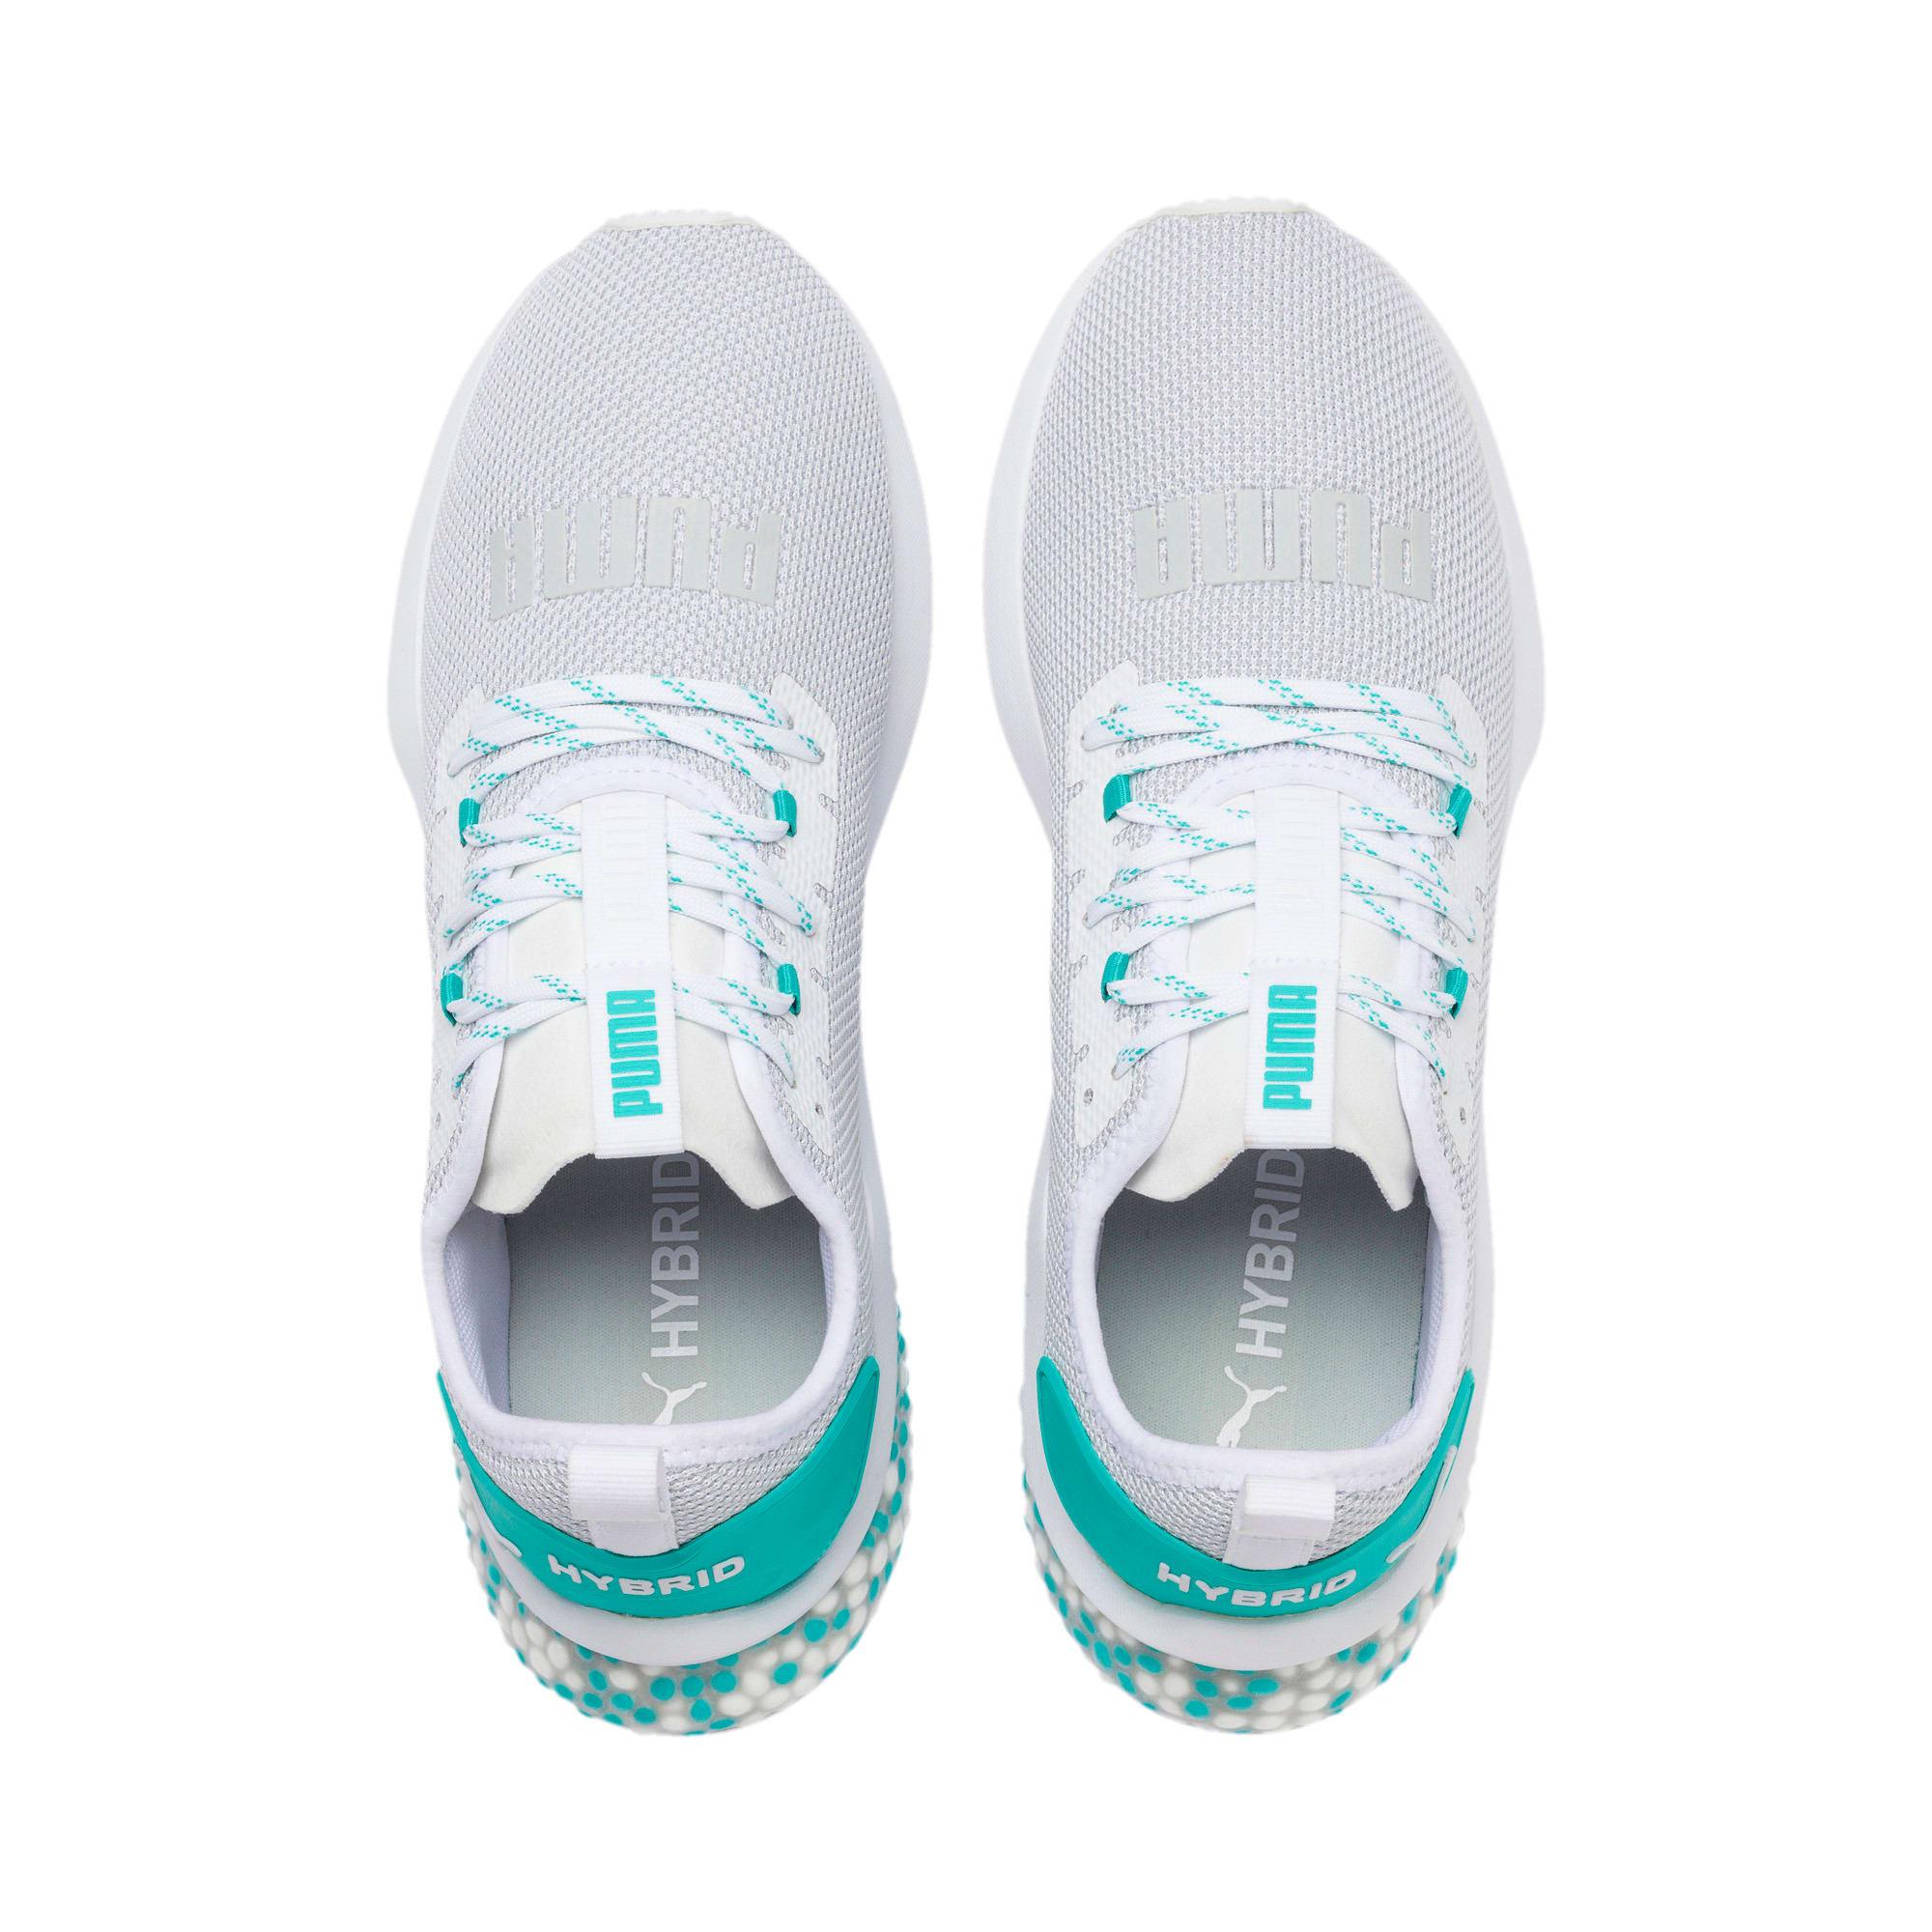 Thumbnail 7 of HYBRID NX Men's Running Shoes, Puma White-Blue Turquoise, medium